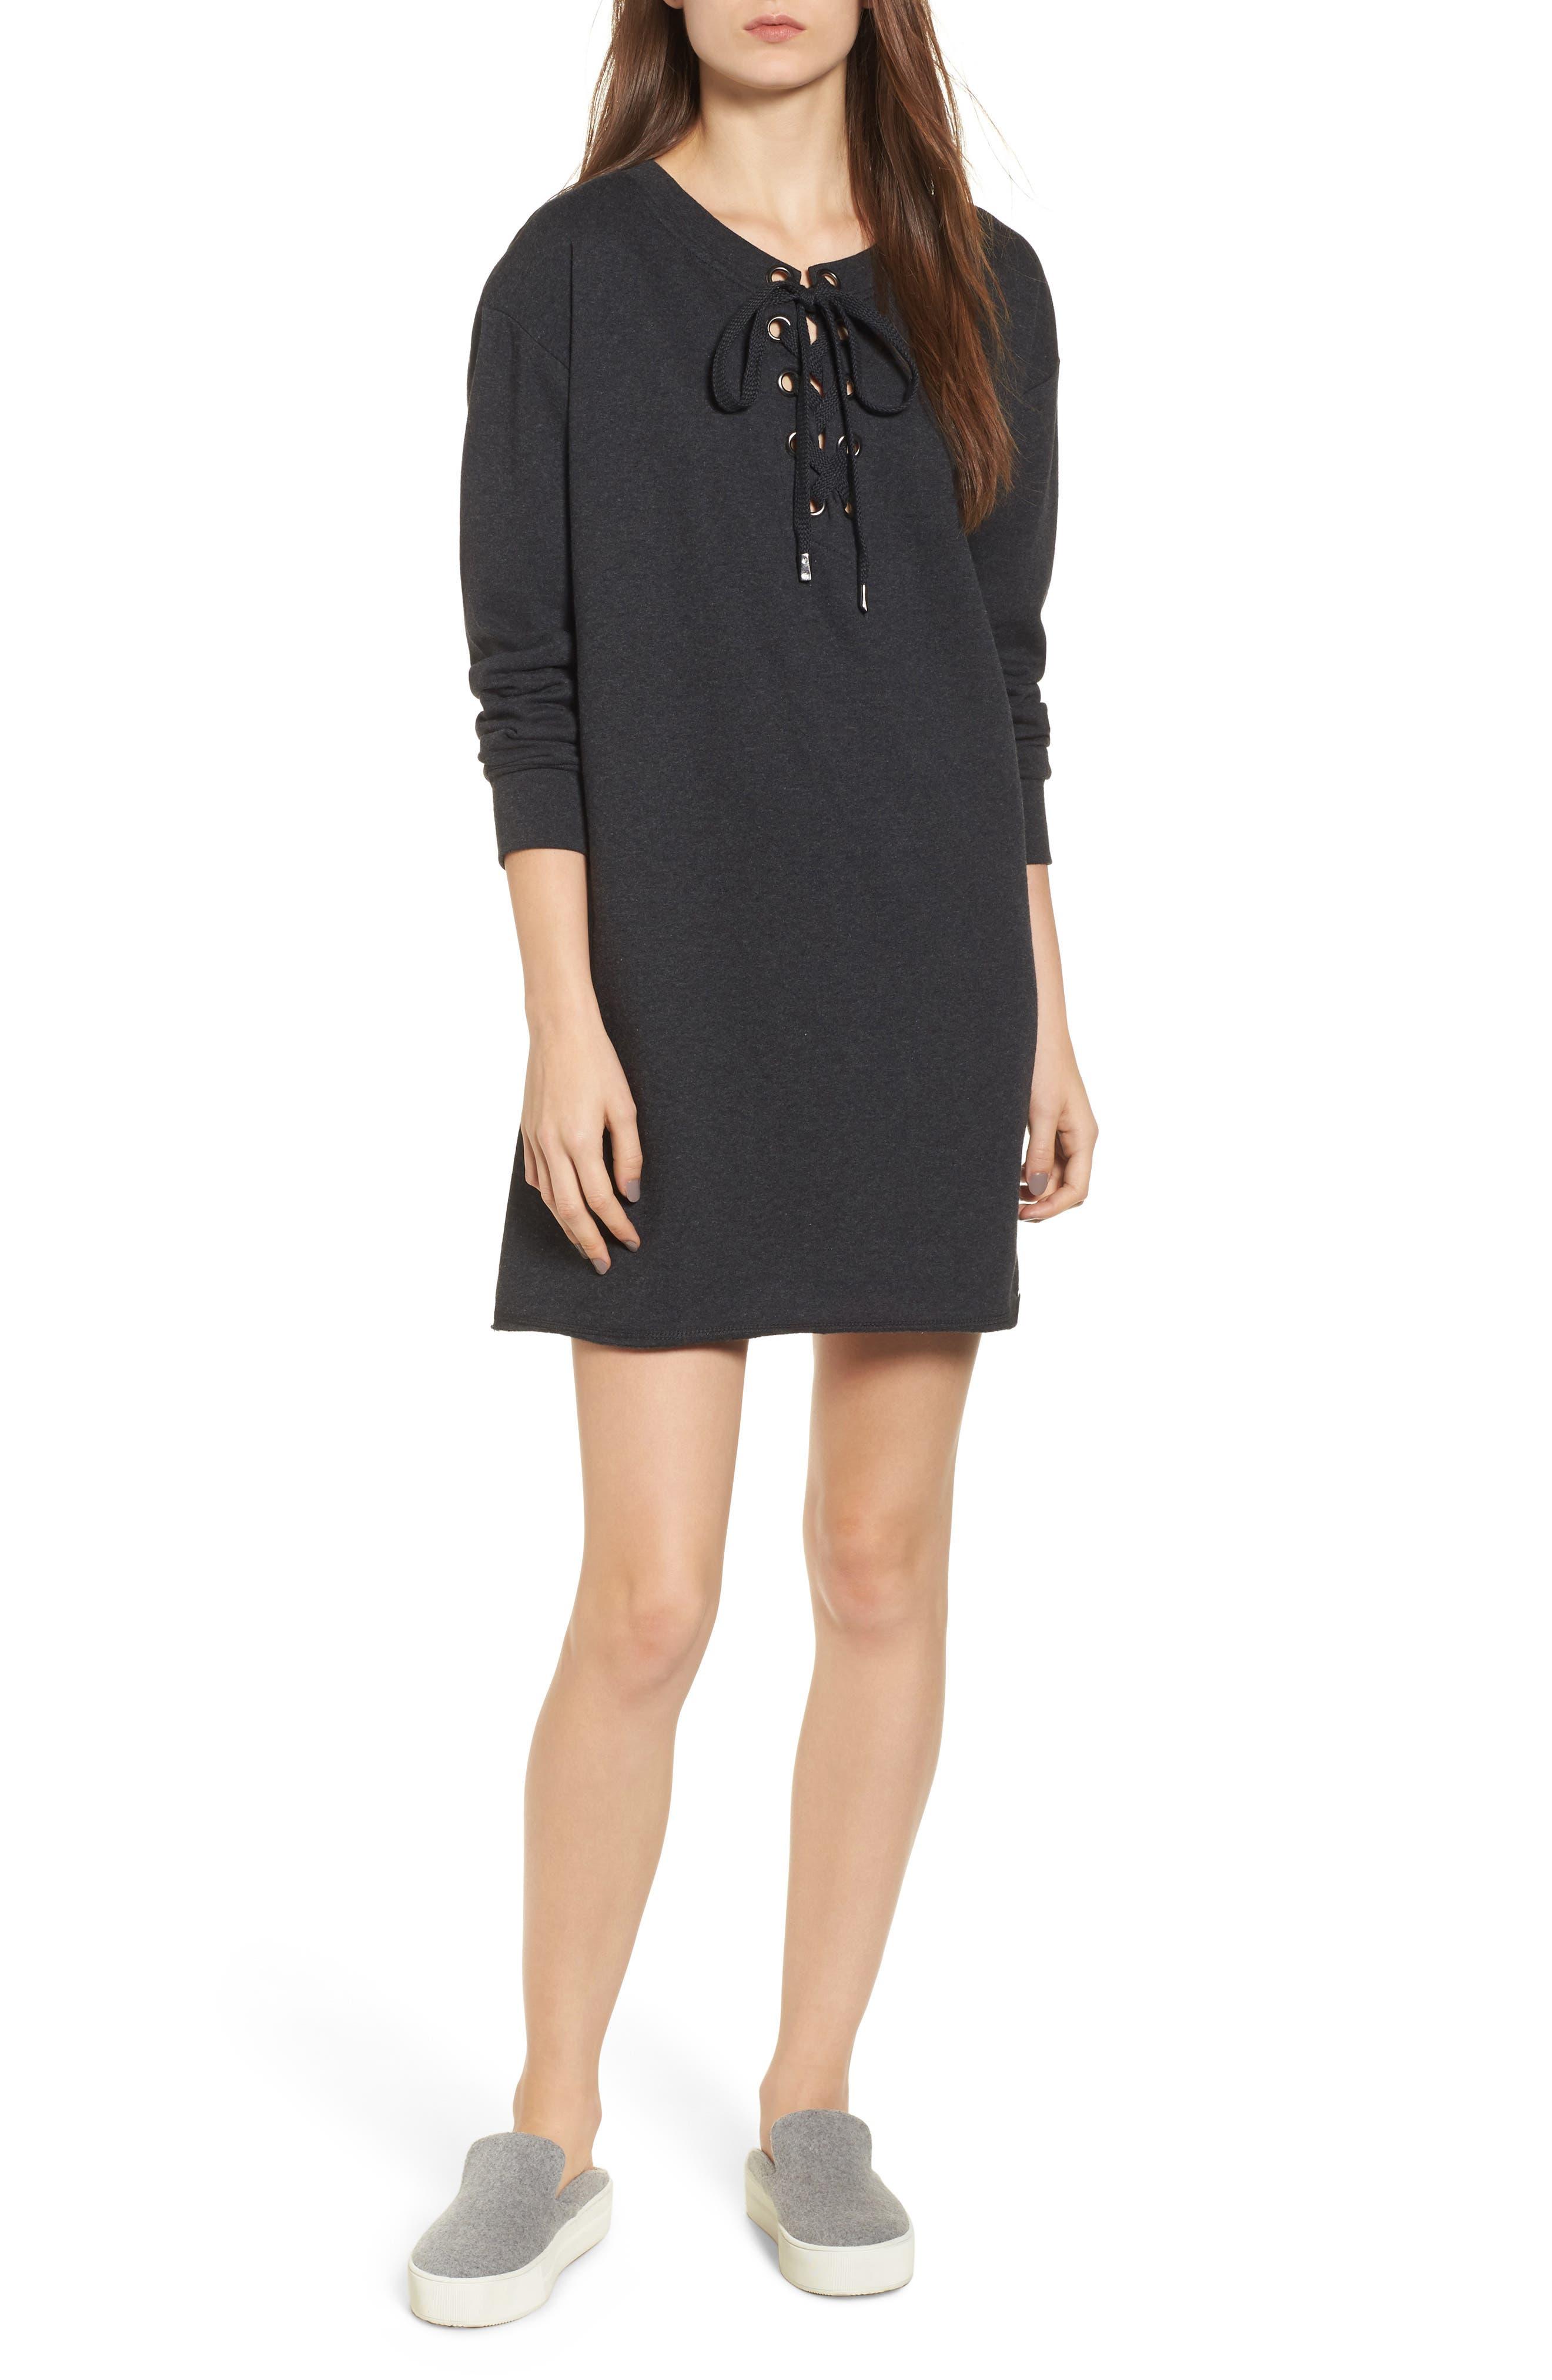 Main Image - Socialite Lace-Up Sweatshirt Dress